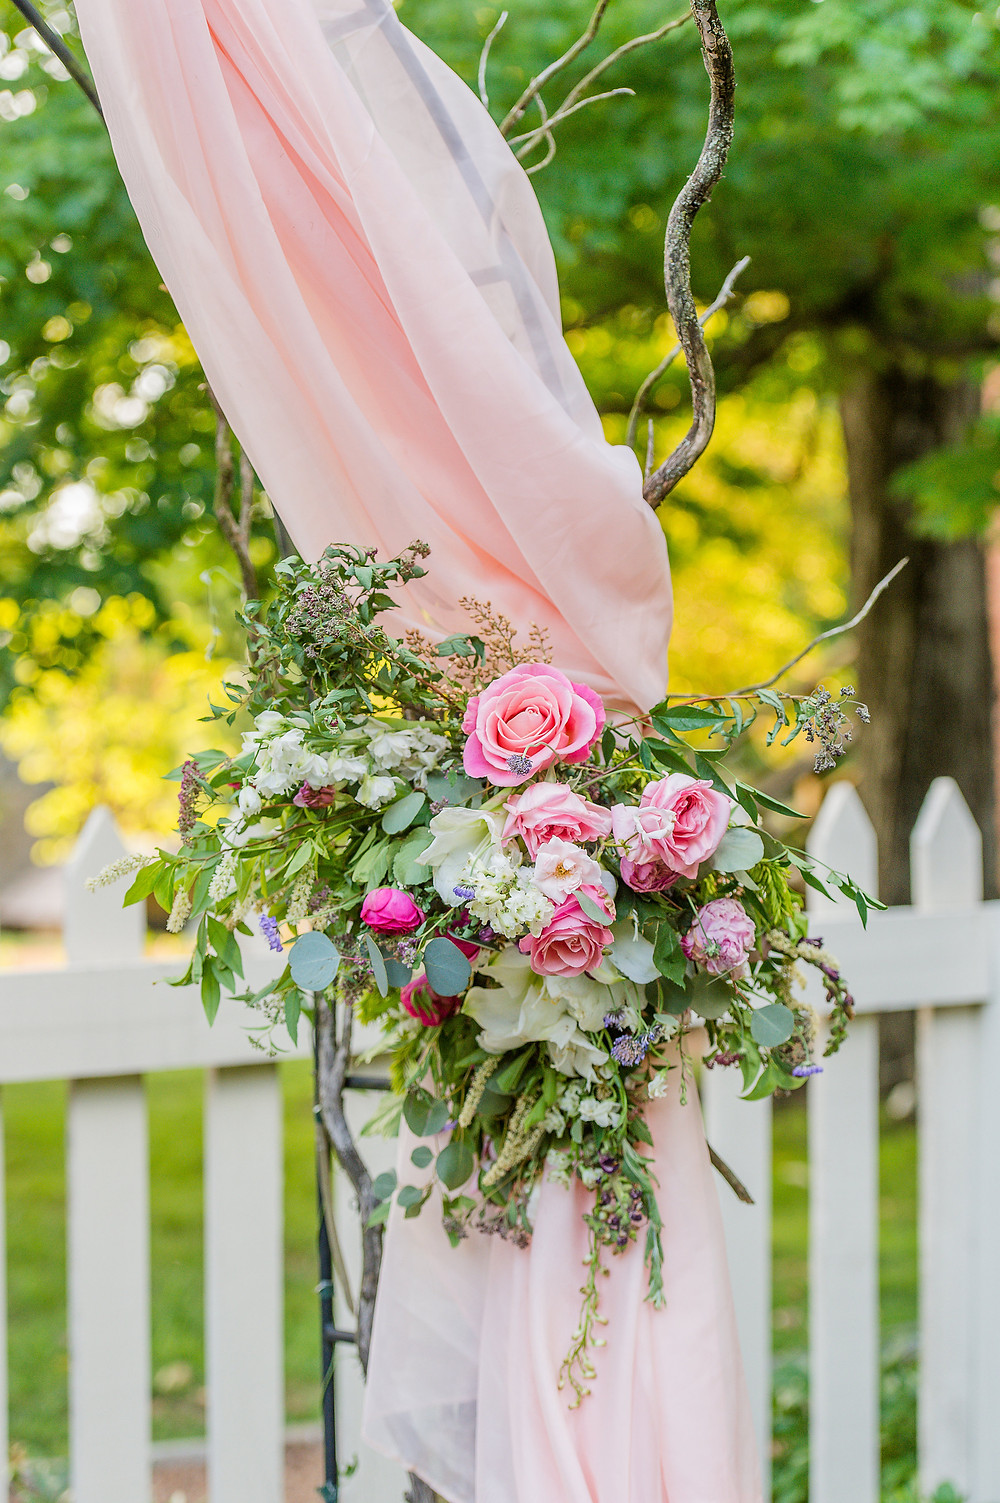 flowers wedding arbor garden